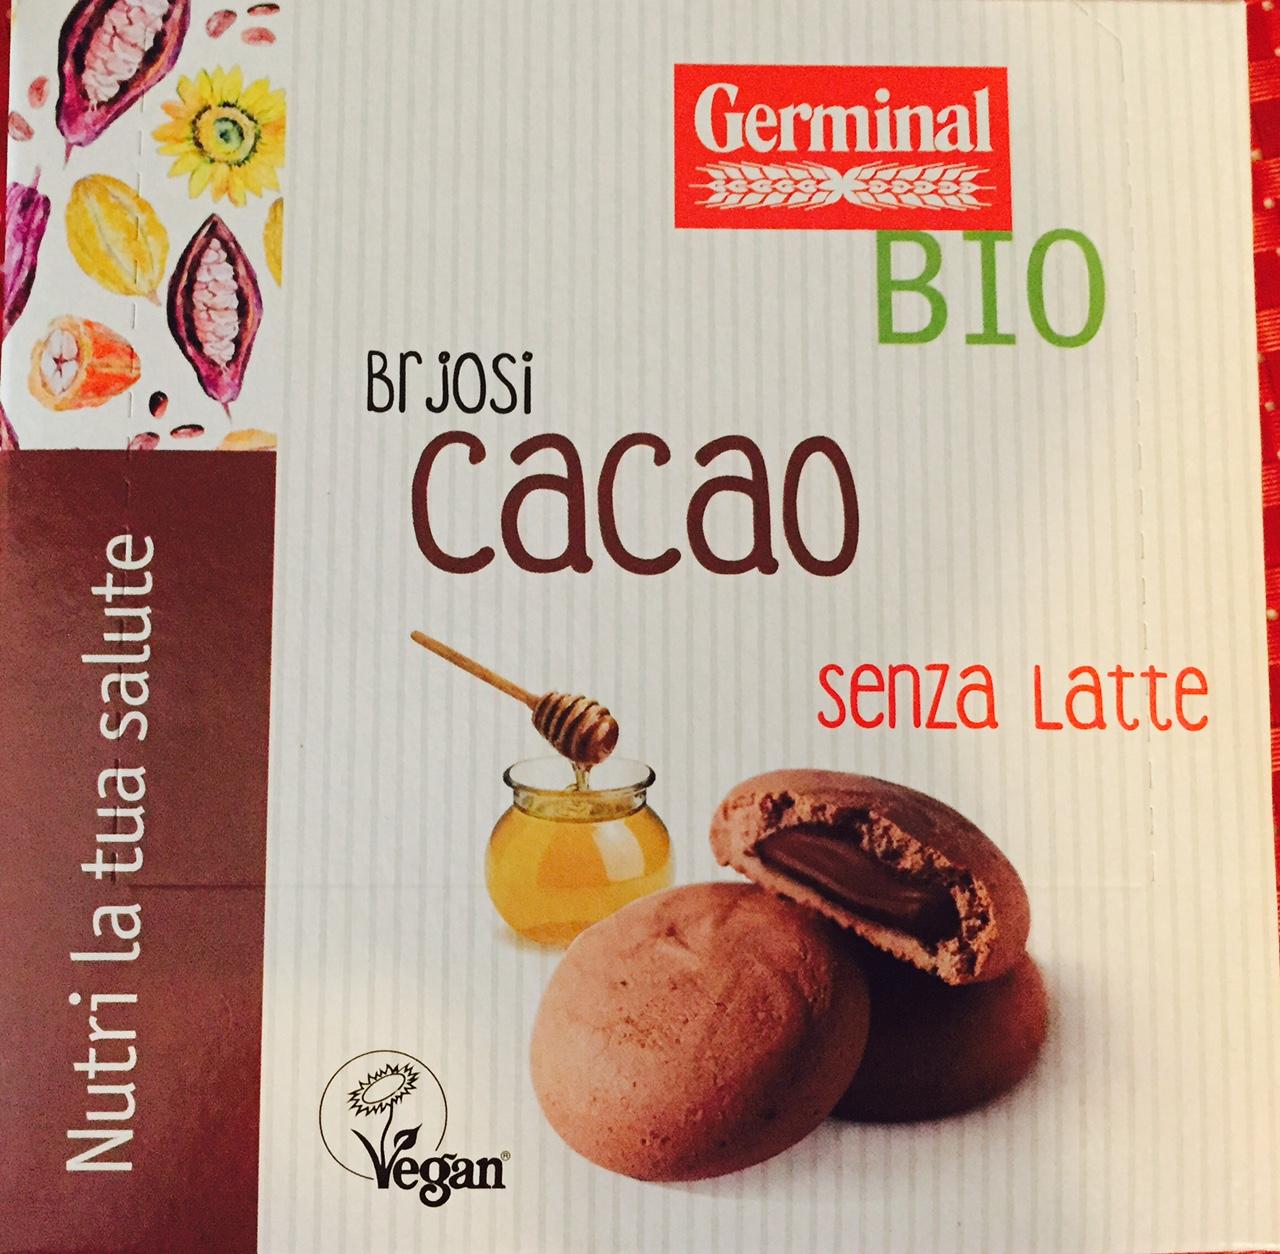 Brjosi al cacao Germinal - lattosio 0% Image